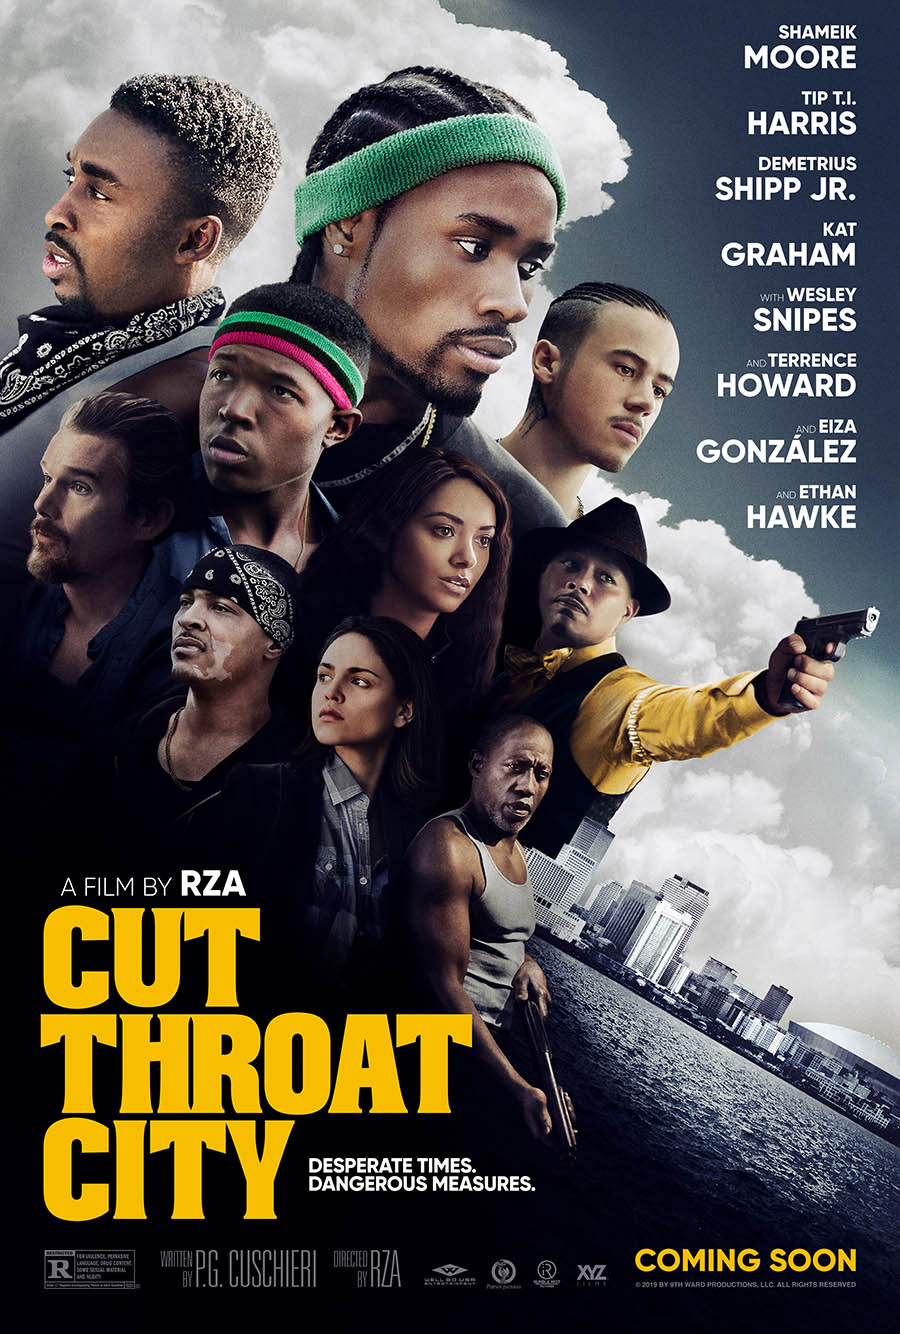 Cut Throat City poster art